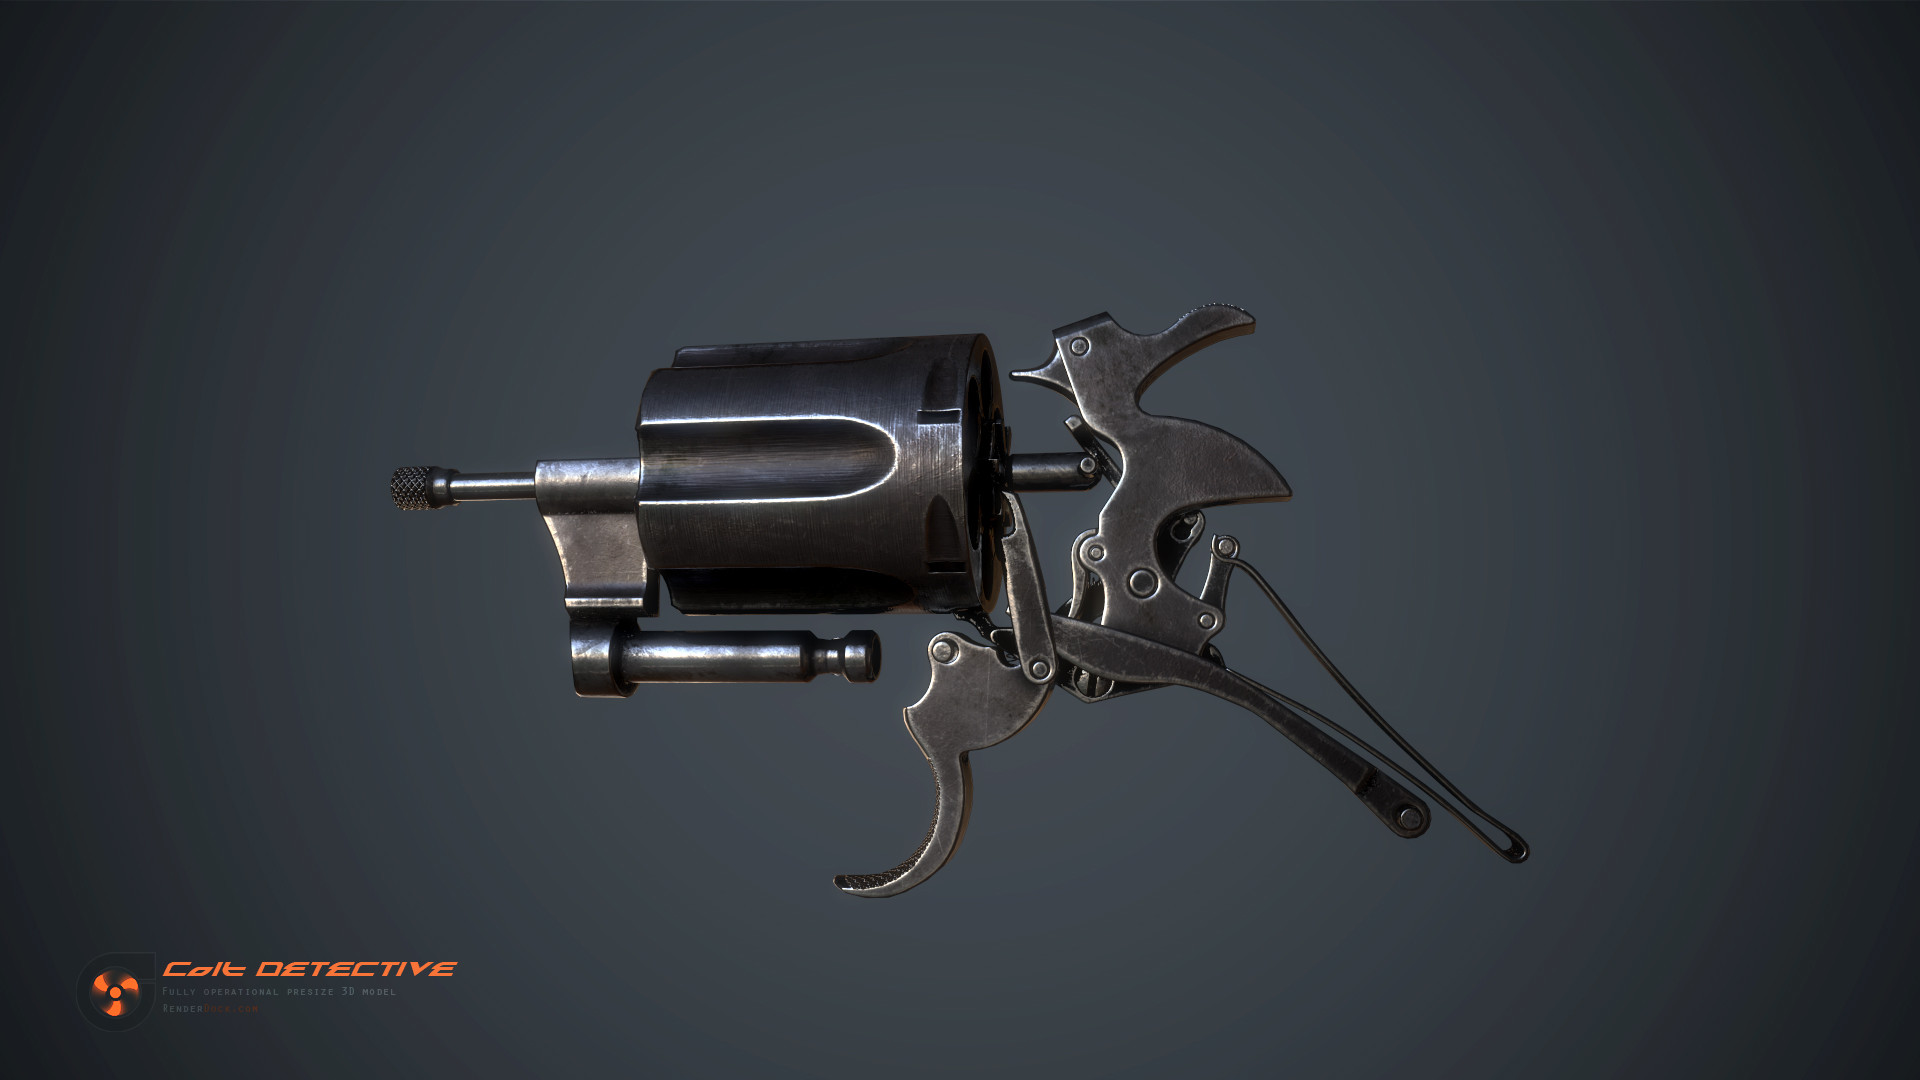 Renderdock studio colt detective detail04